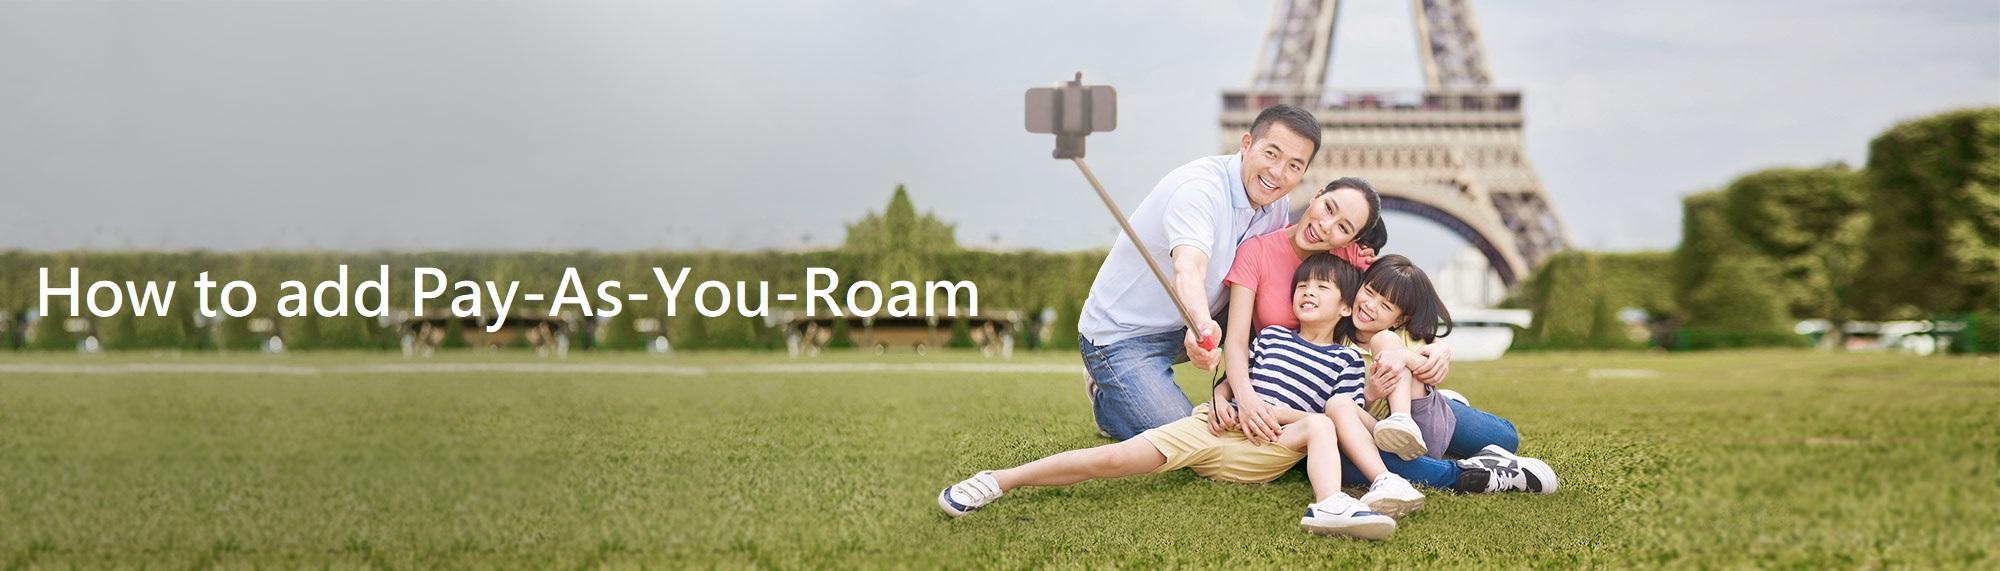 How to add Pay-As-You-Roam via My StarHub App?